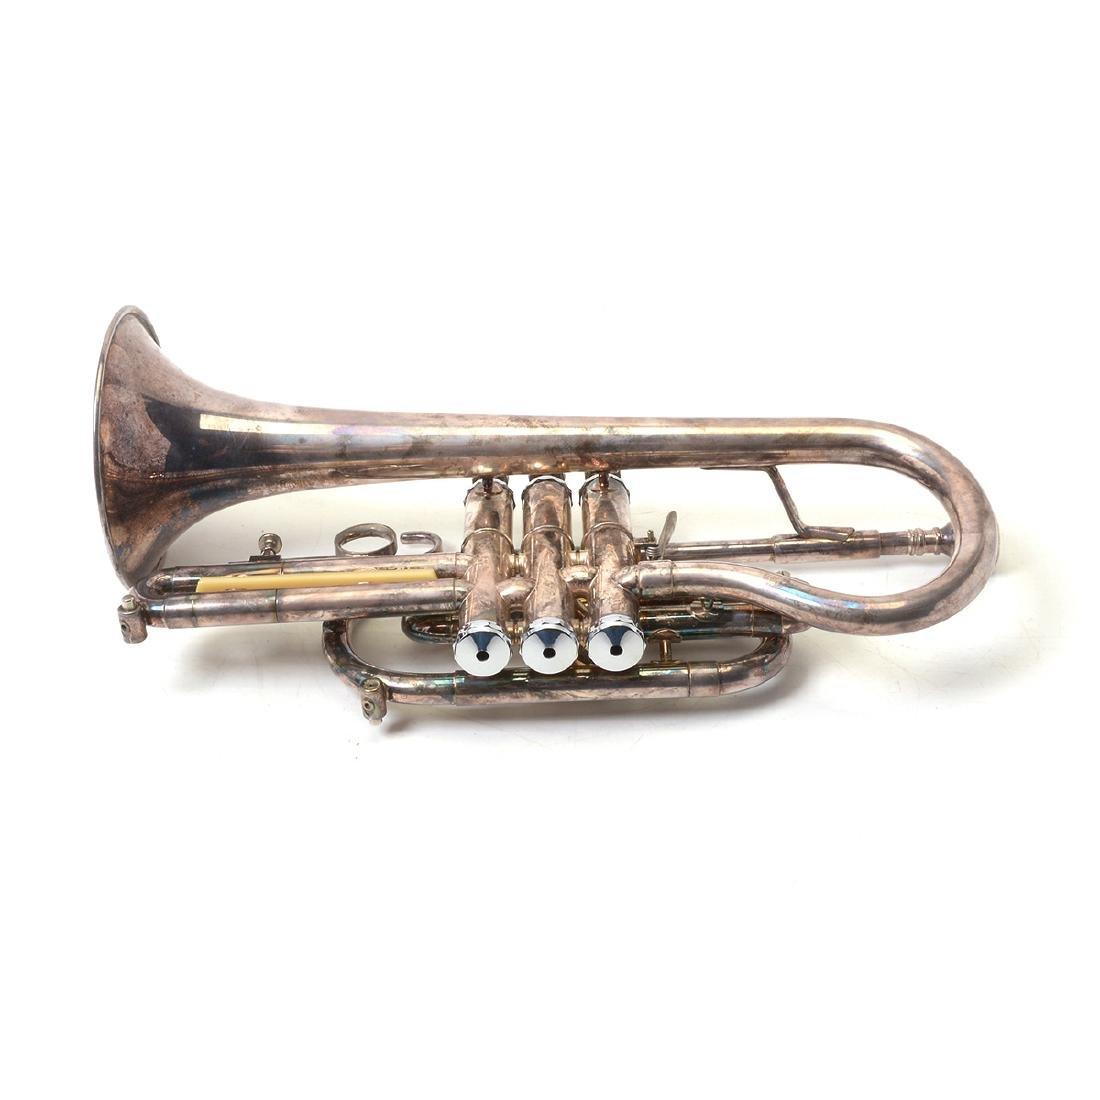 Capri by Getzen Trumpet - 6